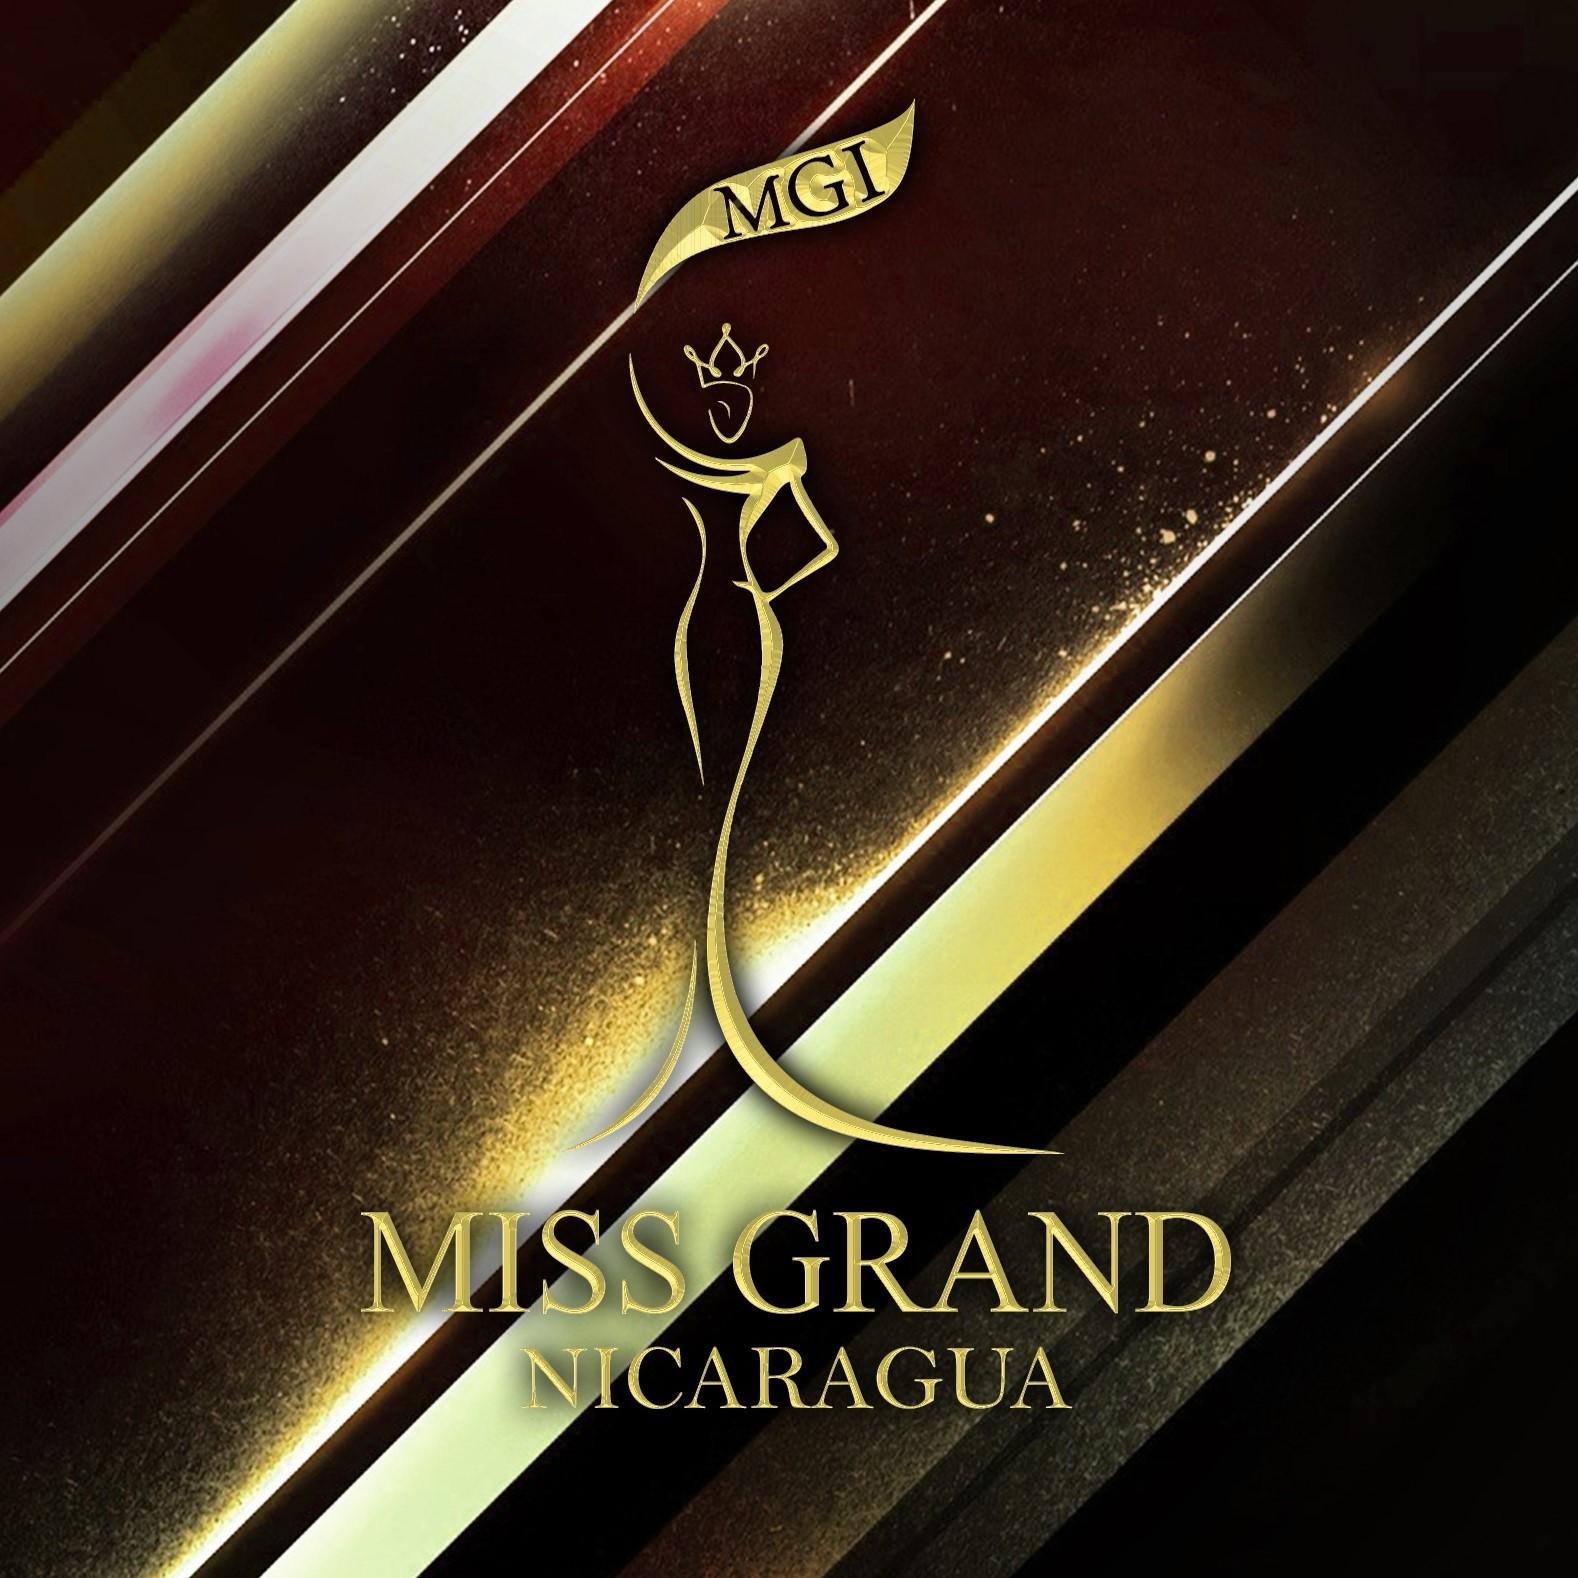 candidatas a miss grand nicaragua 2021. final: 31 july. O25vaI